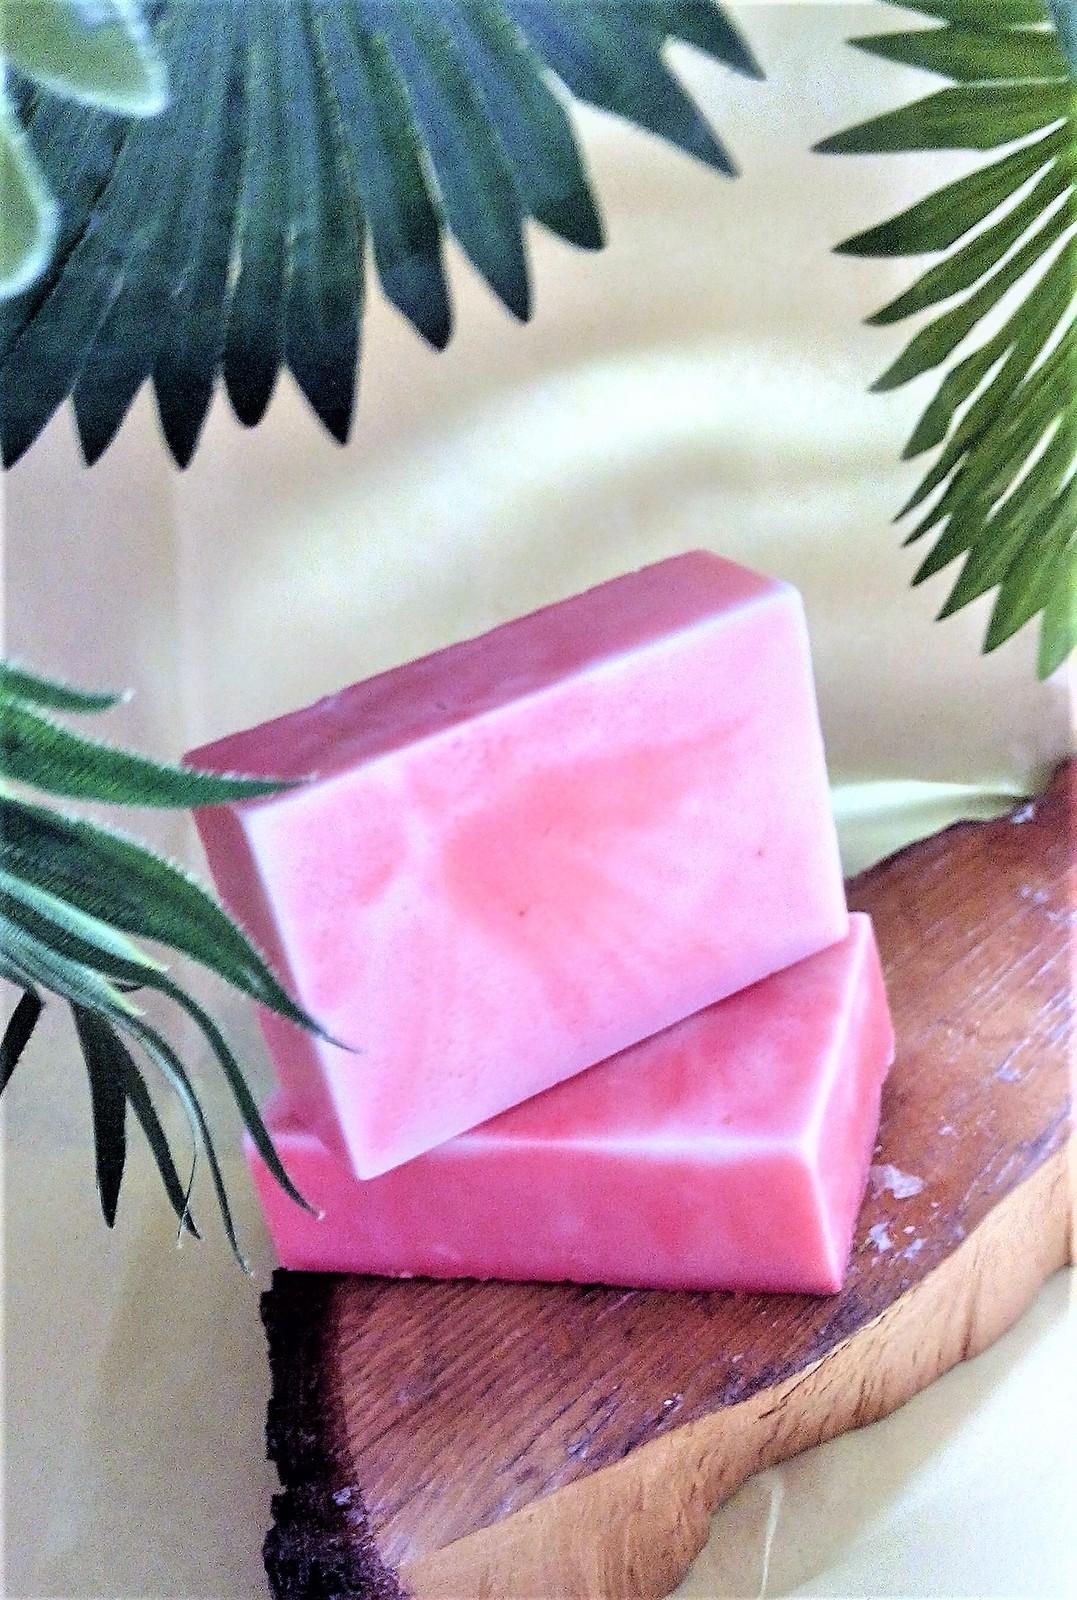 black raspberry vanilla soap, bar soap, bathing soap, health and beauty, bath an - $4.00